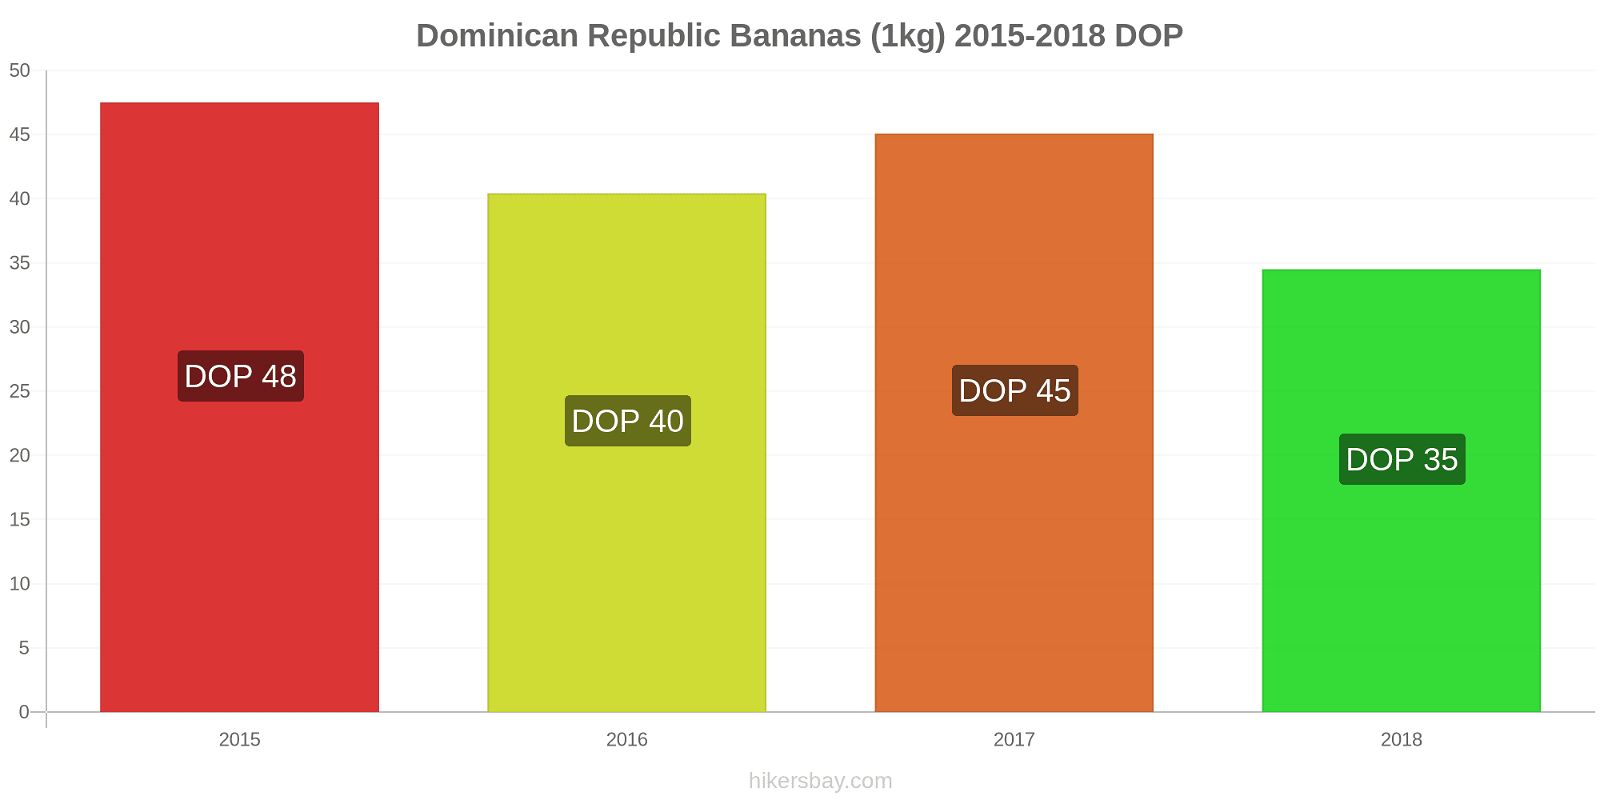 Dominican Republic price changes Bananas (1kg) hikersbay.com